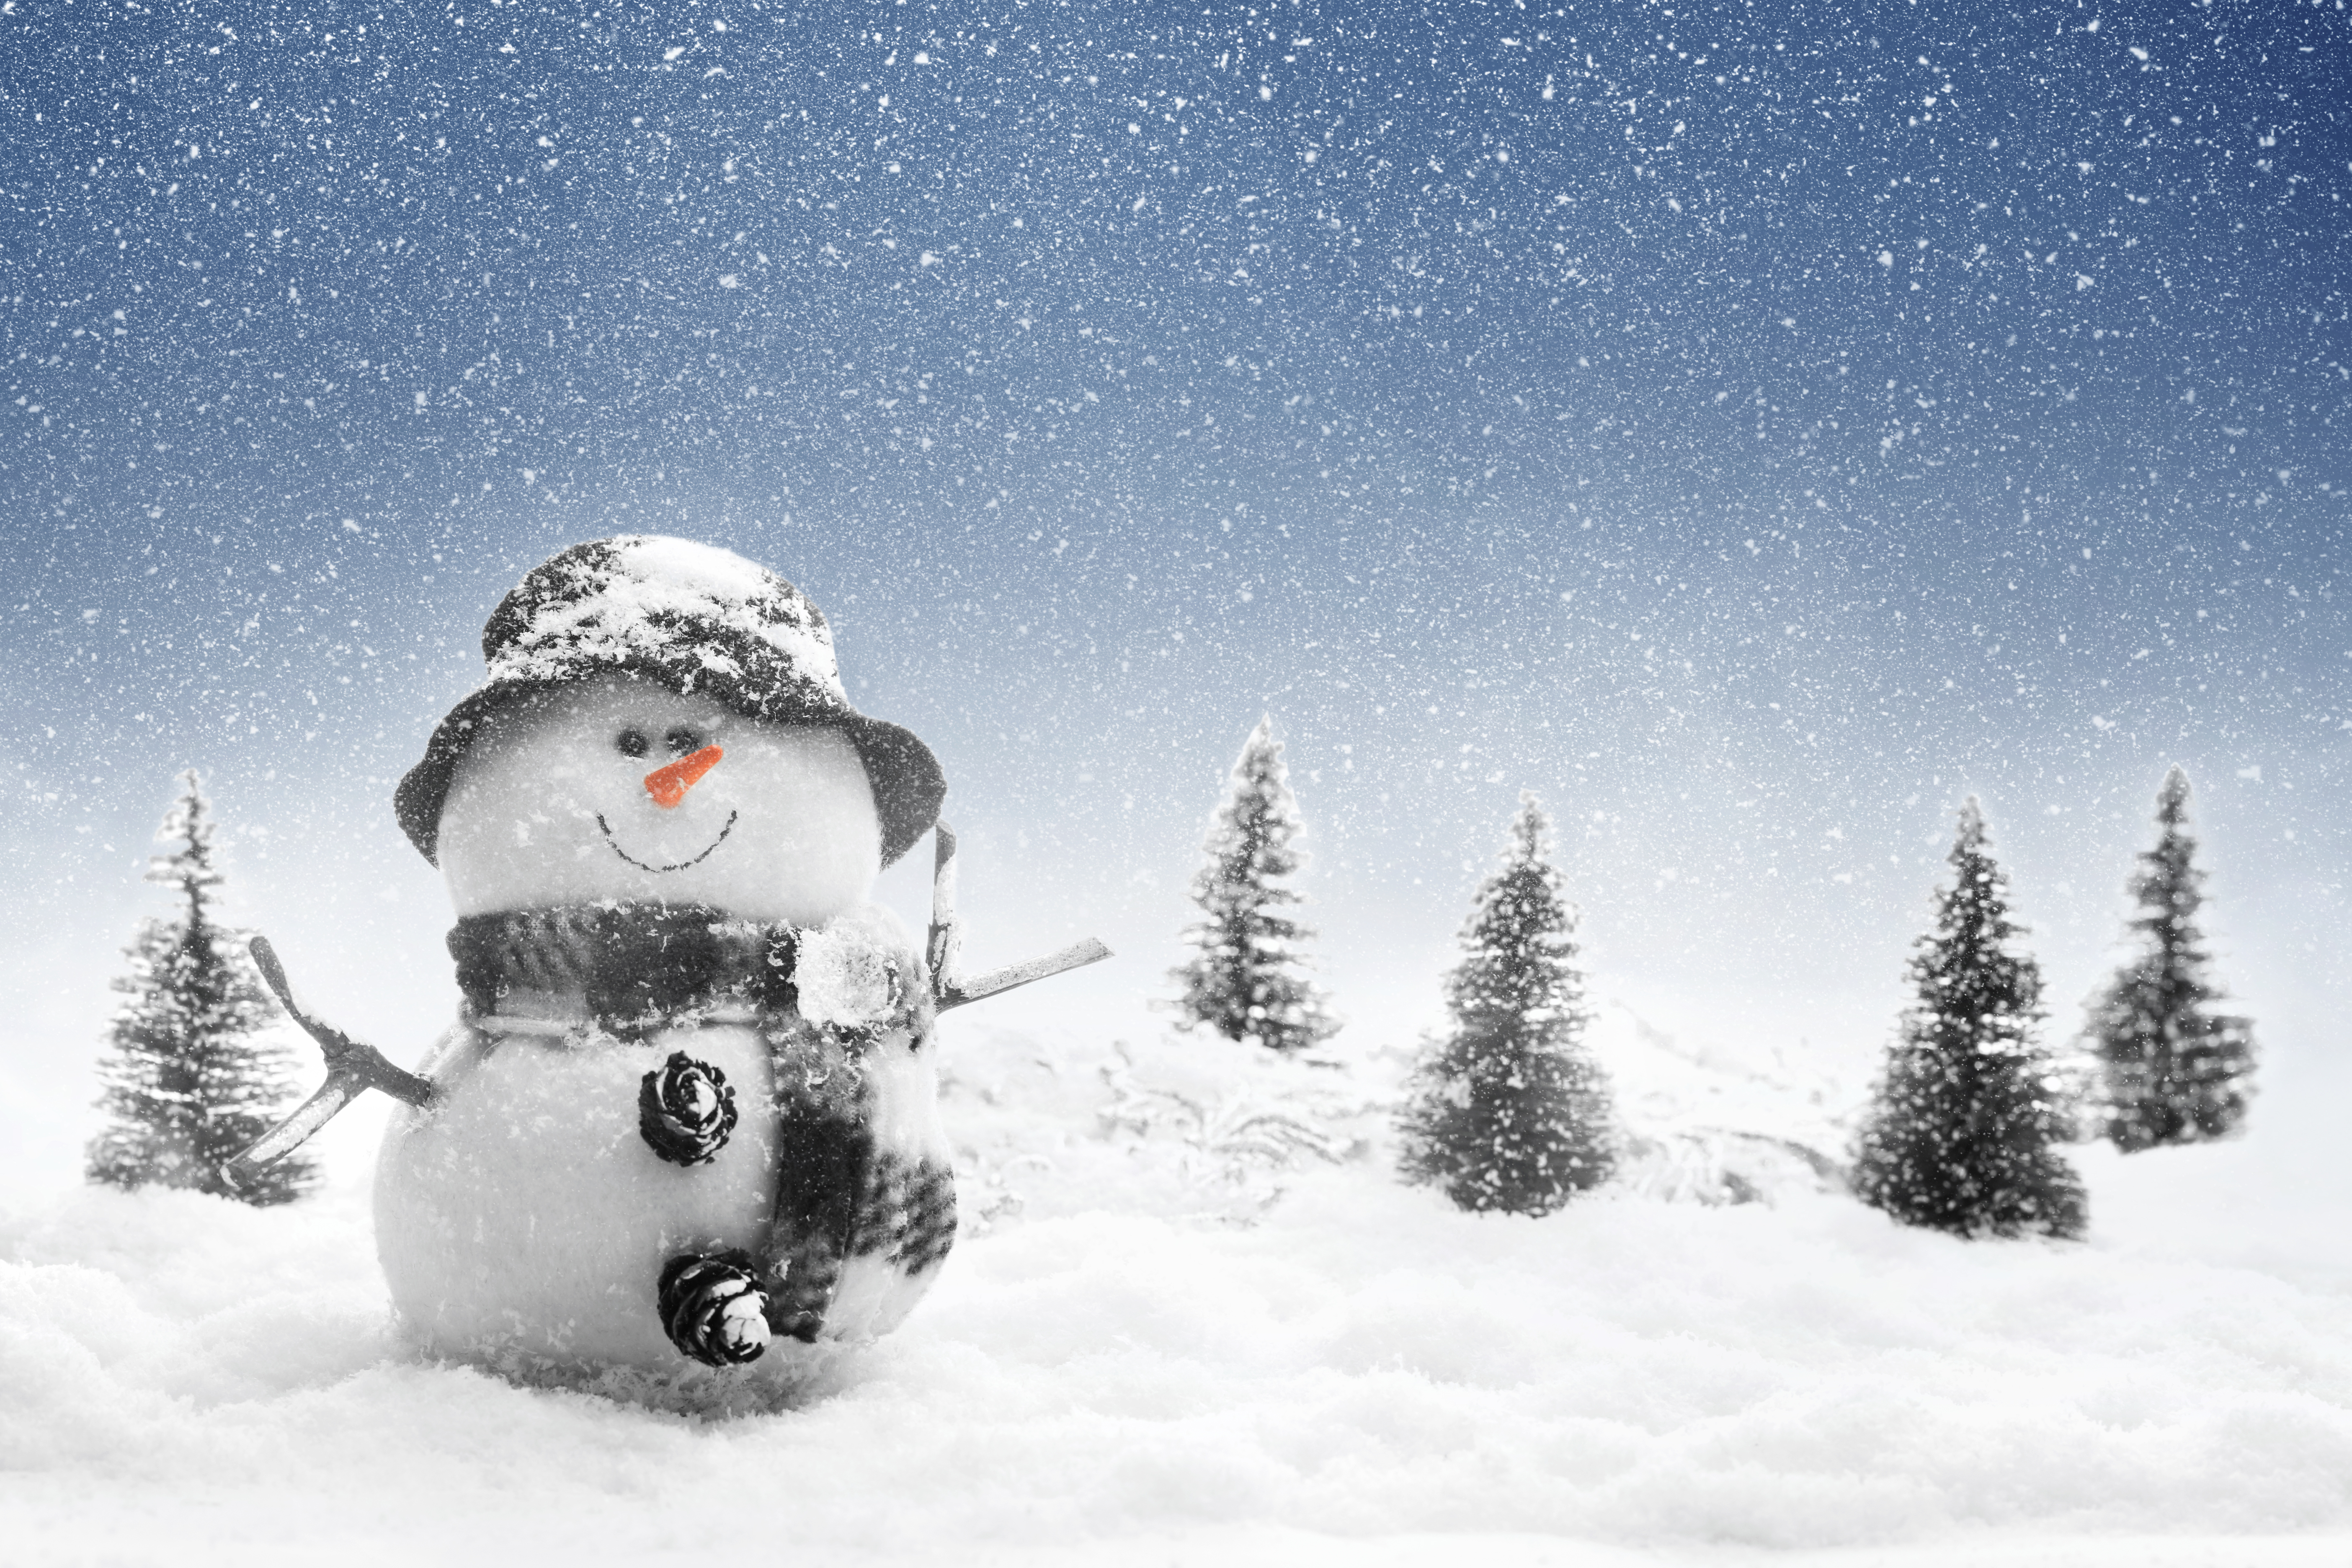 Snow Snowfall Snowman Winter 5616x3744